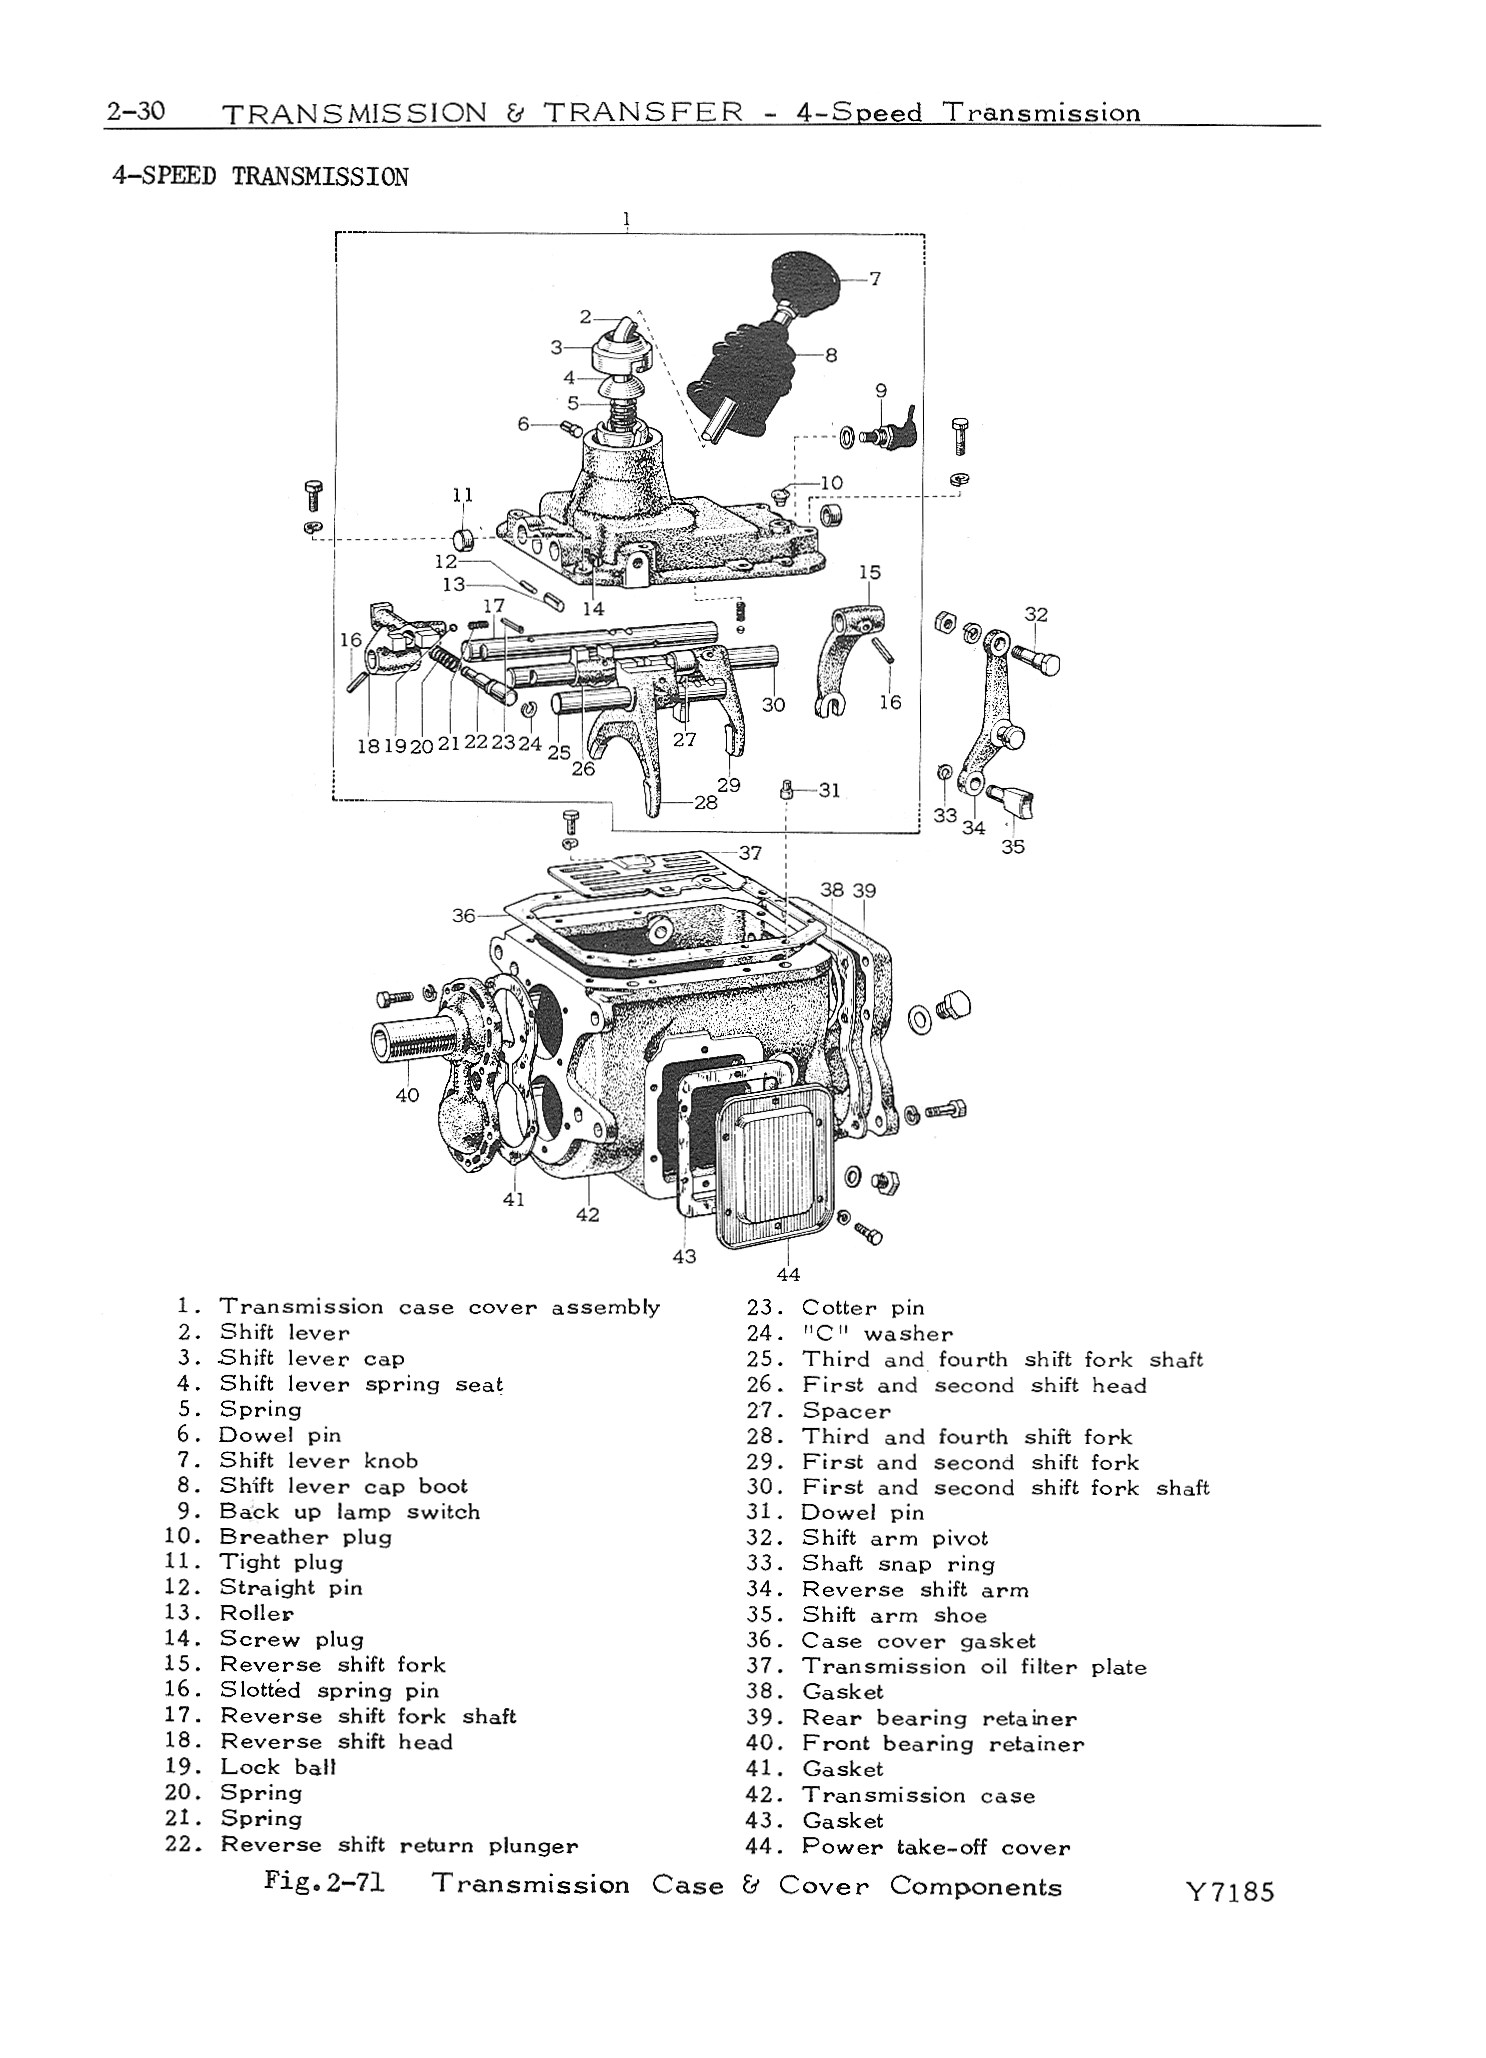 1971 FJ40 Chassis/Body Manual